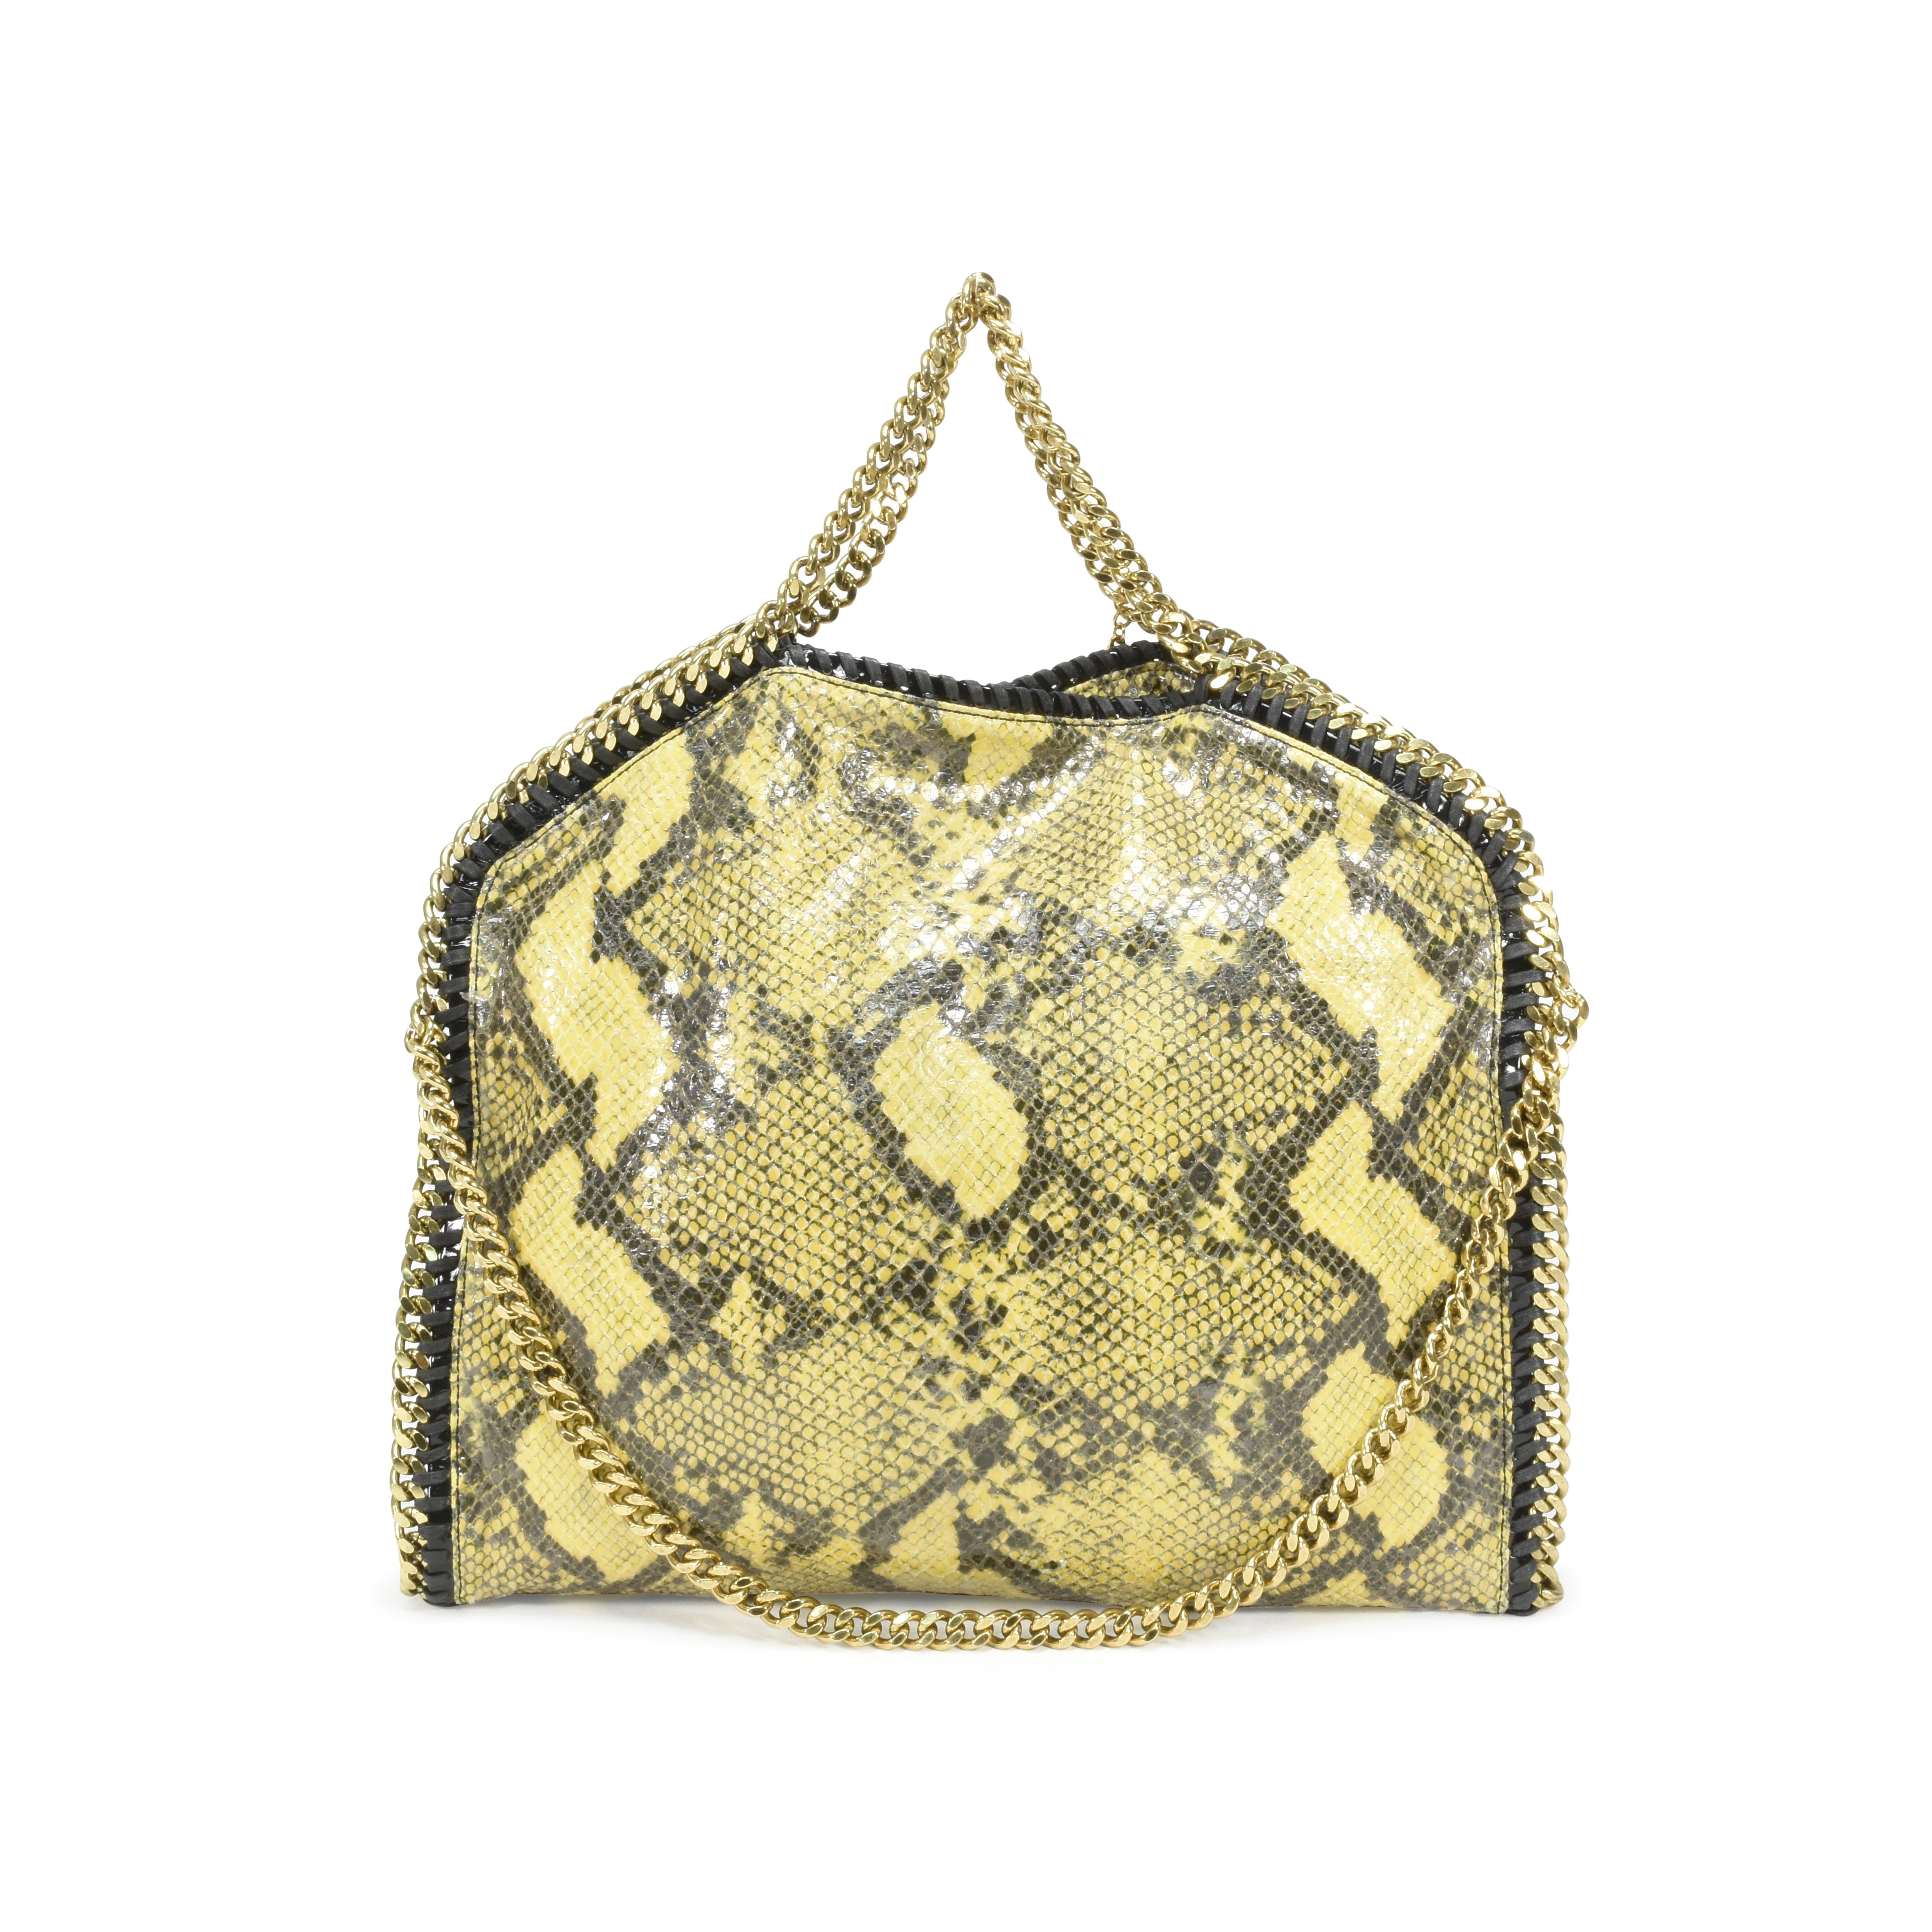 8abc6f45a2fd Authentic Second Hand Stella McCartney Falabella Faux Python Shoulder bag  (PSS-361-00025)